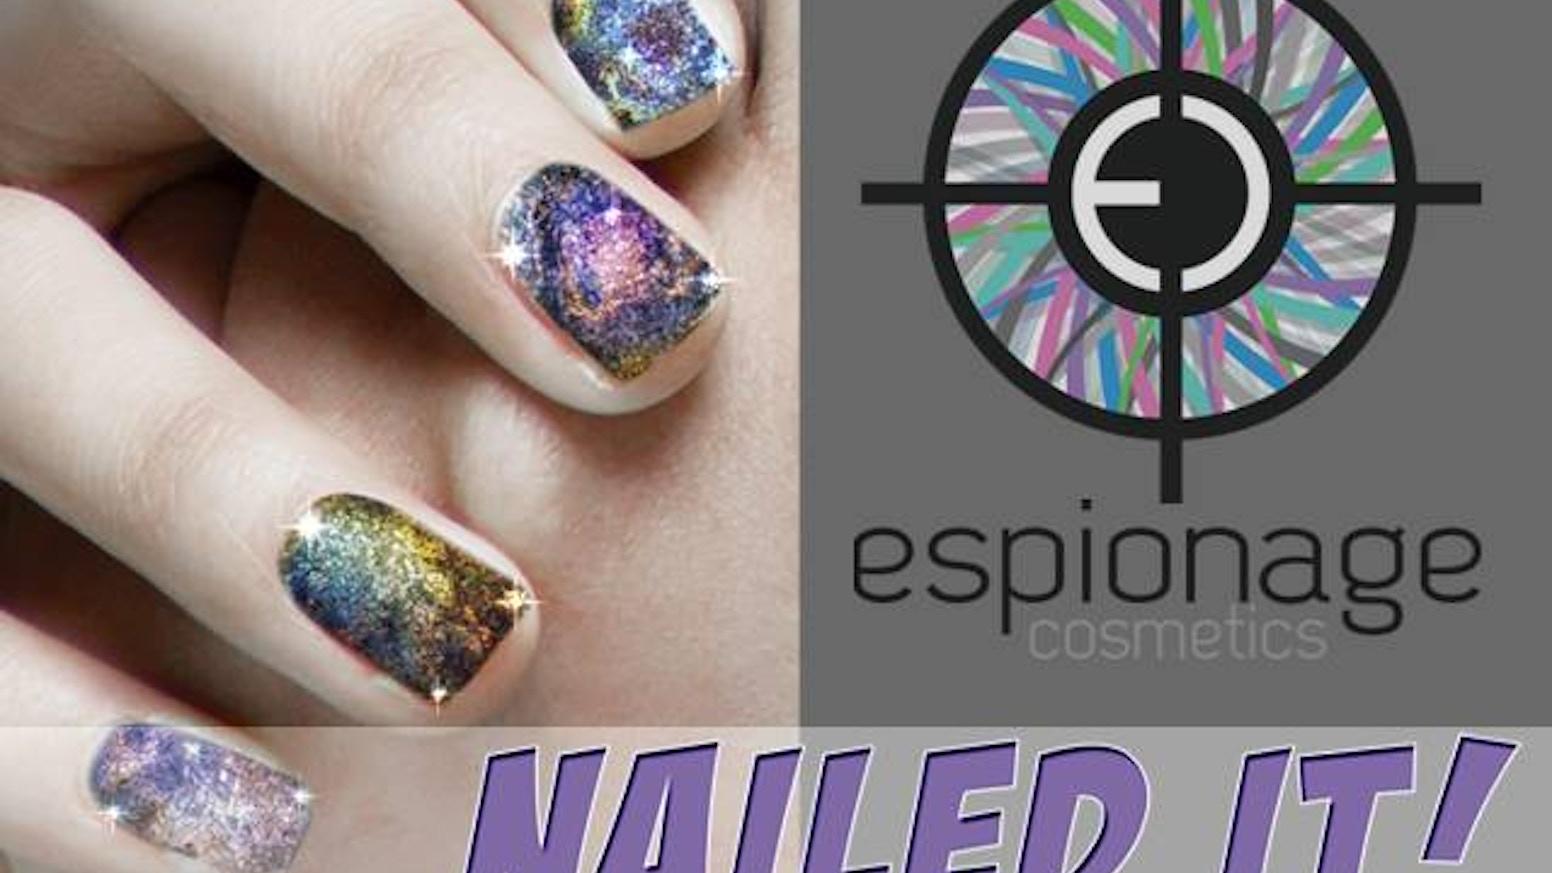 Espionage Cosmetics Nailed It By Espionage Cosmetics Kickstarter